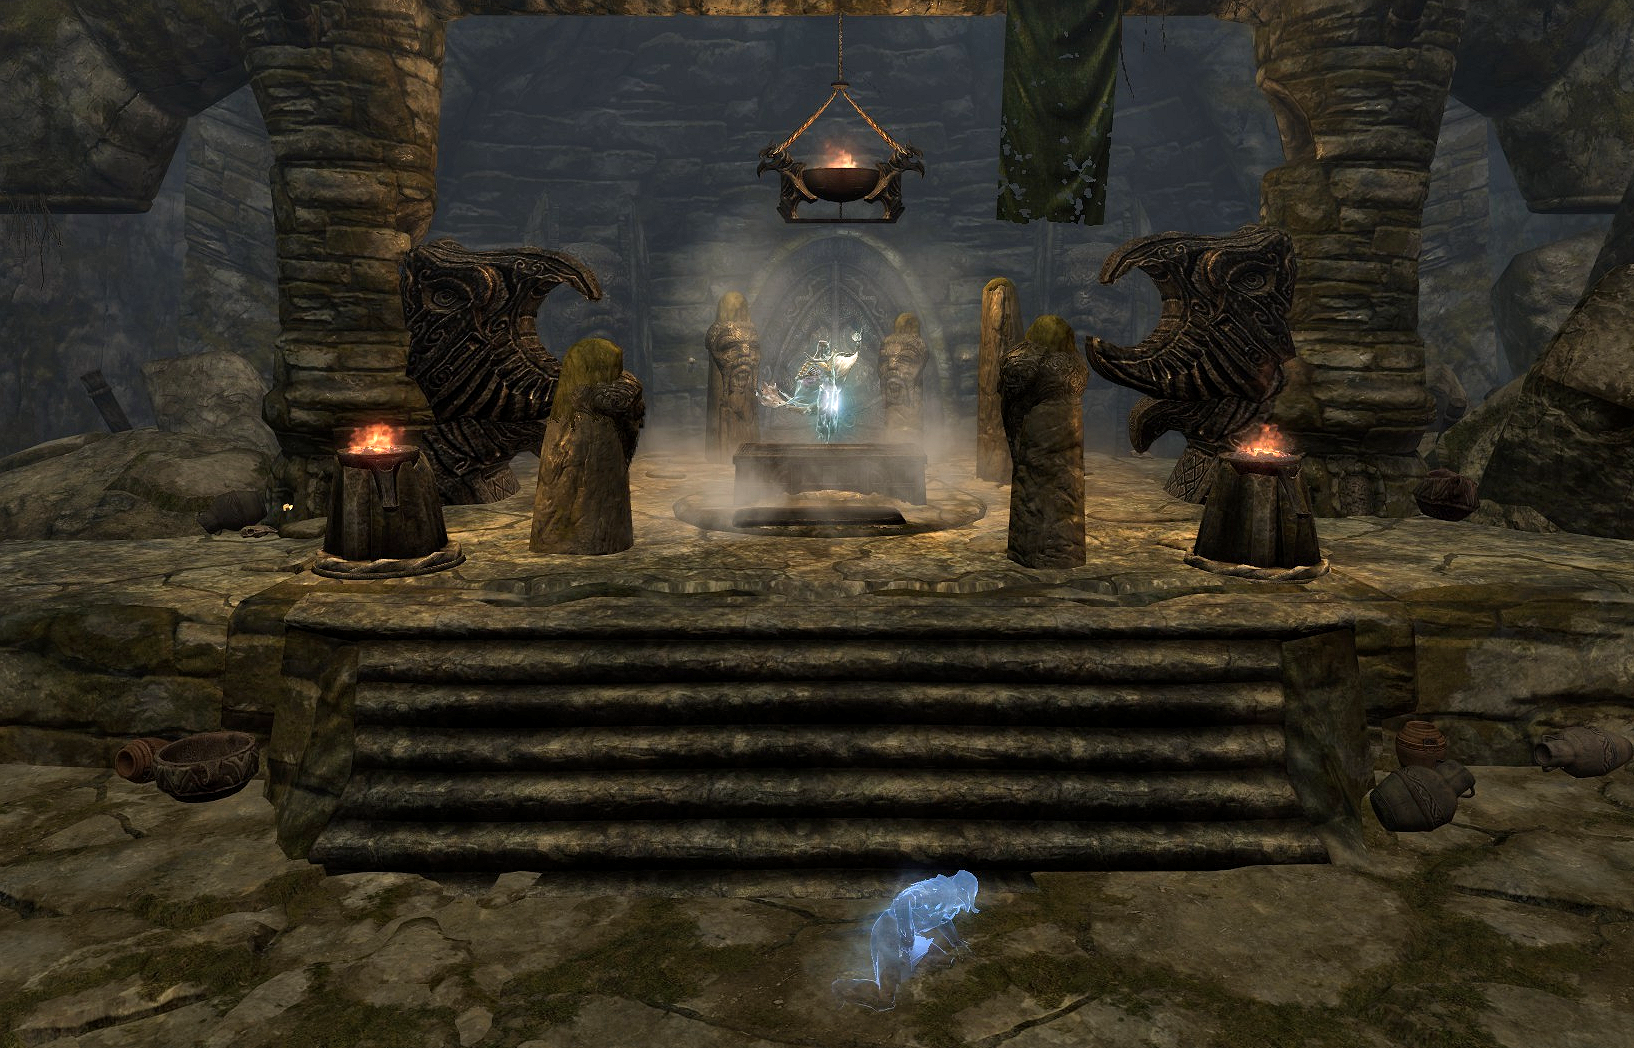 Valthume | Elder Scrolls | Fandom powered by Wikia